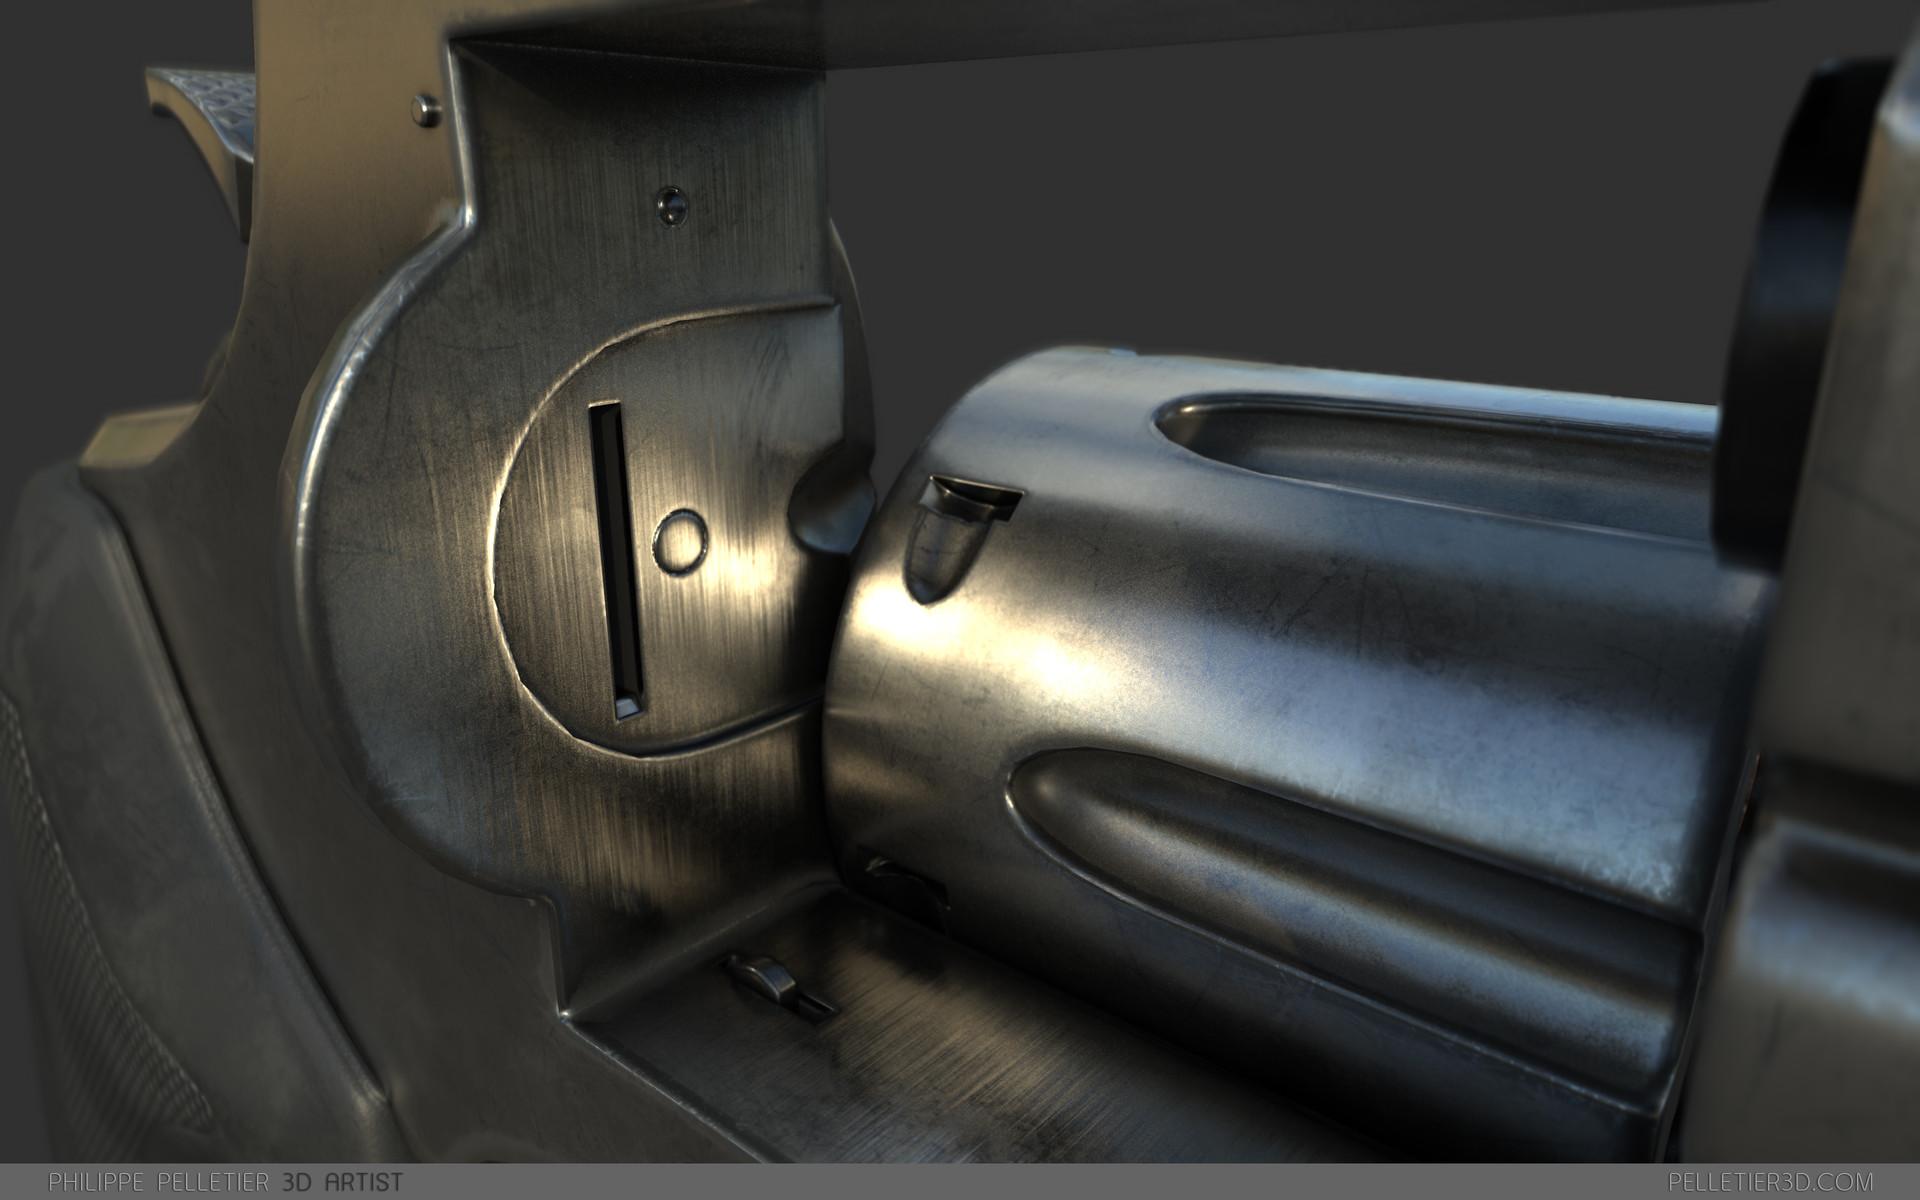 Philippe pelletier revolver 009